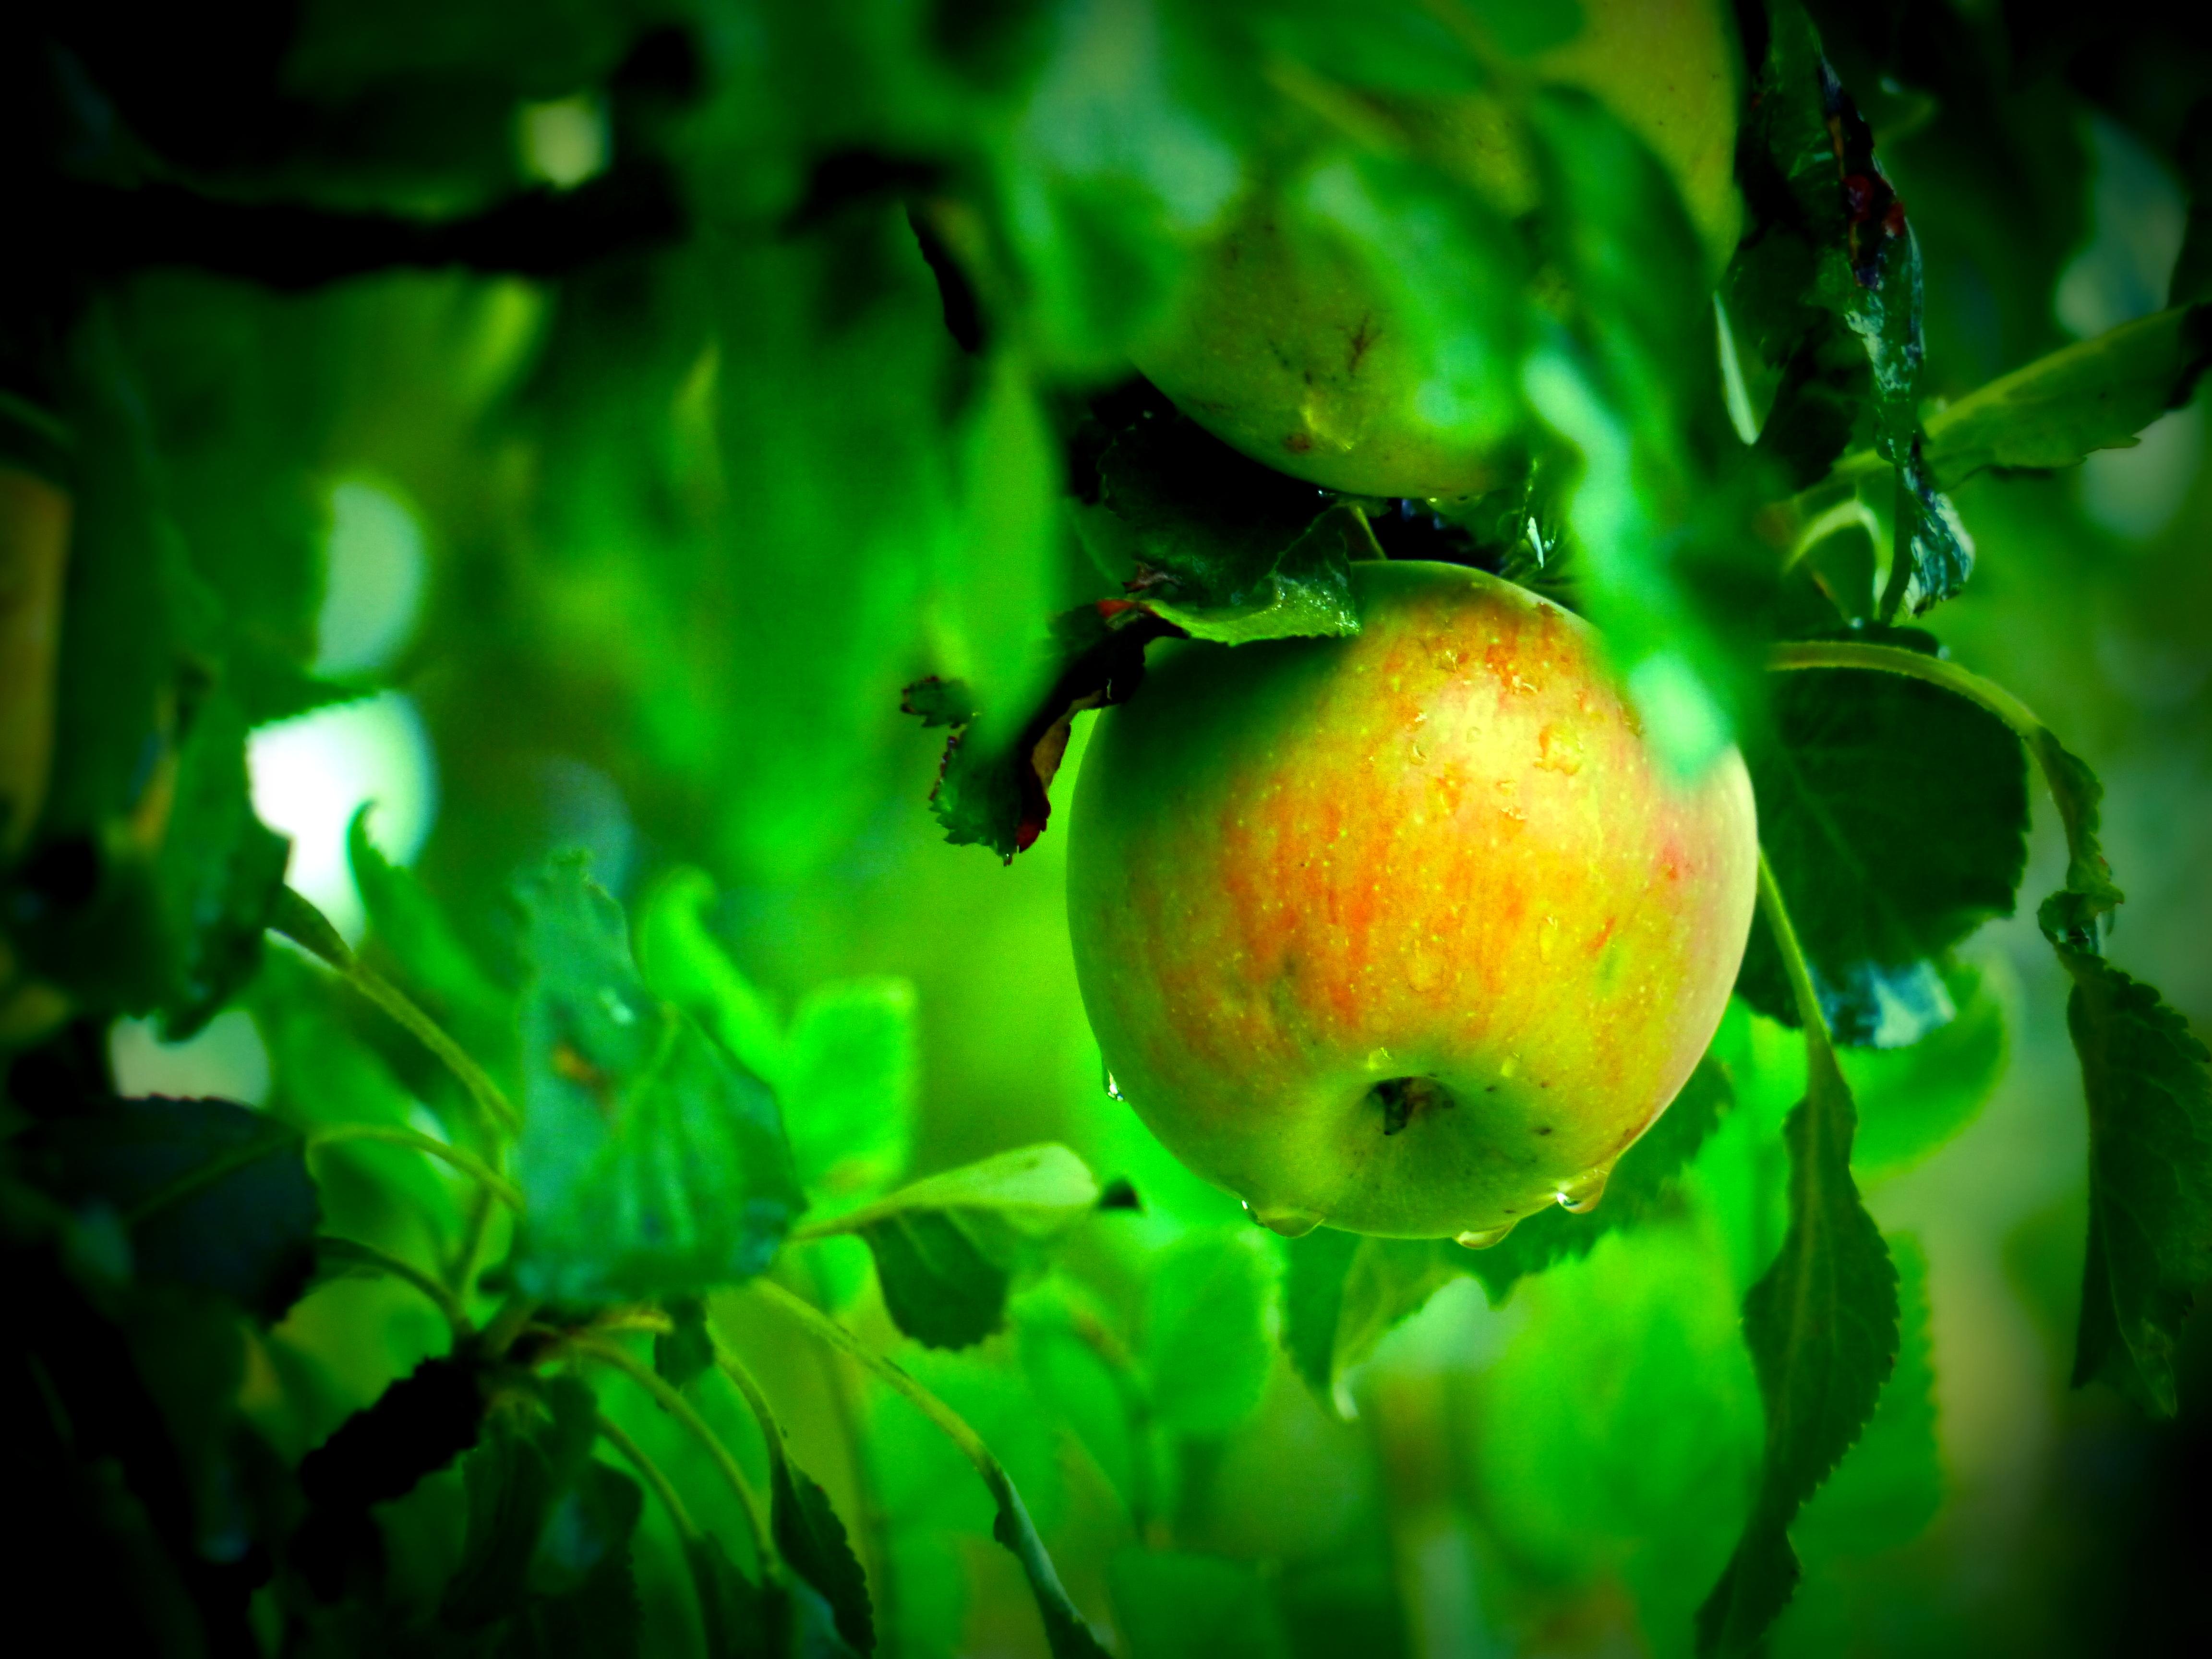 обои яблоня, яблоко, листья, ветви картинки фото